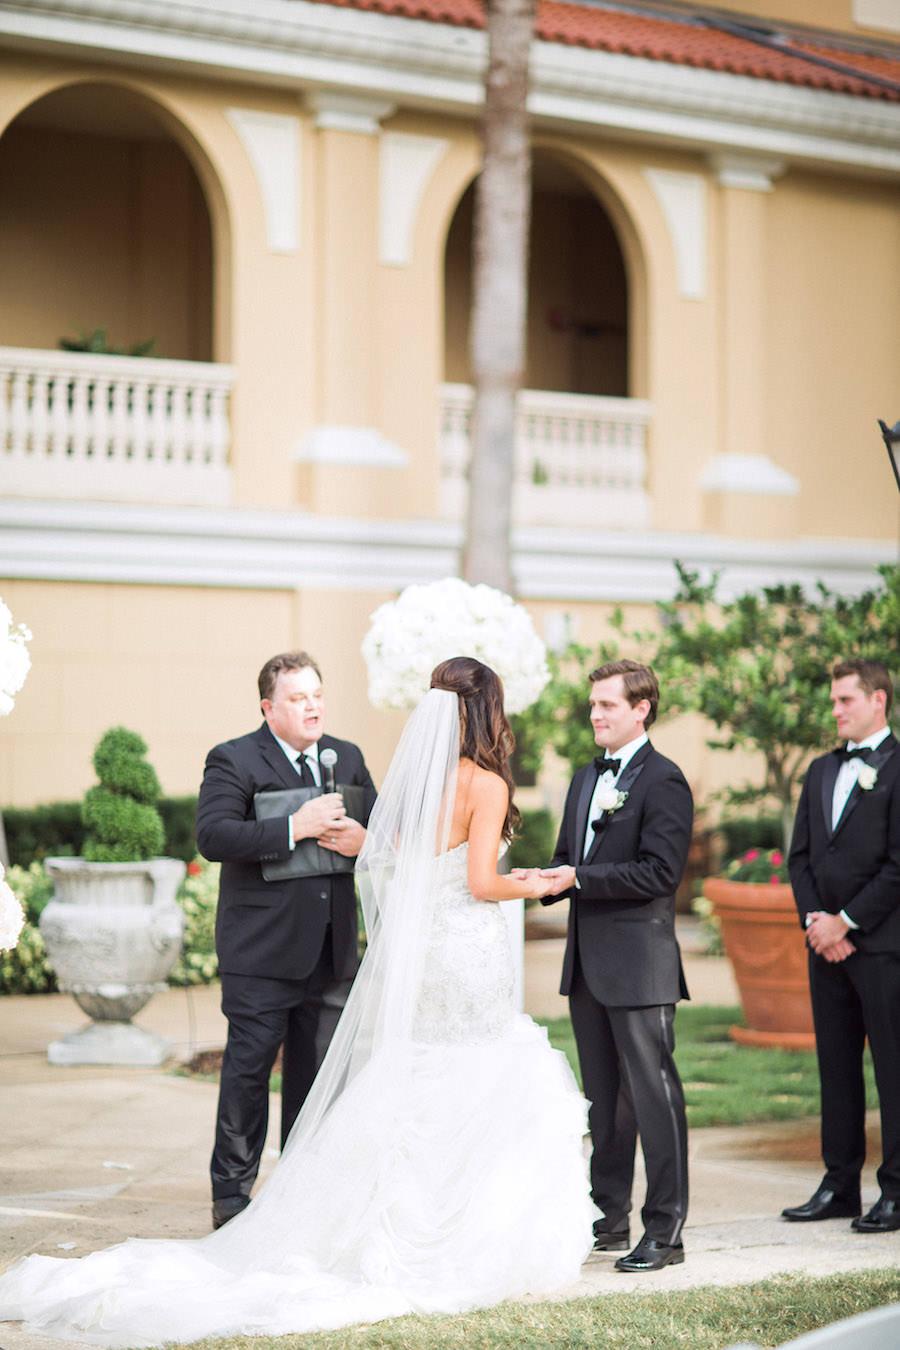 Elegant, Outdoor Wedding Ceremony Bride and Groom Portrait